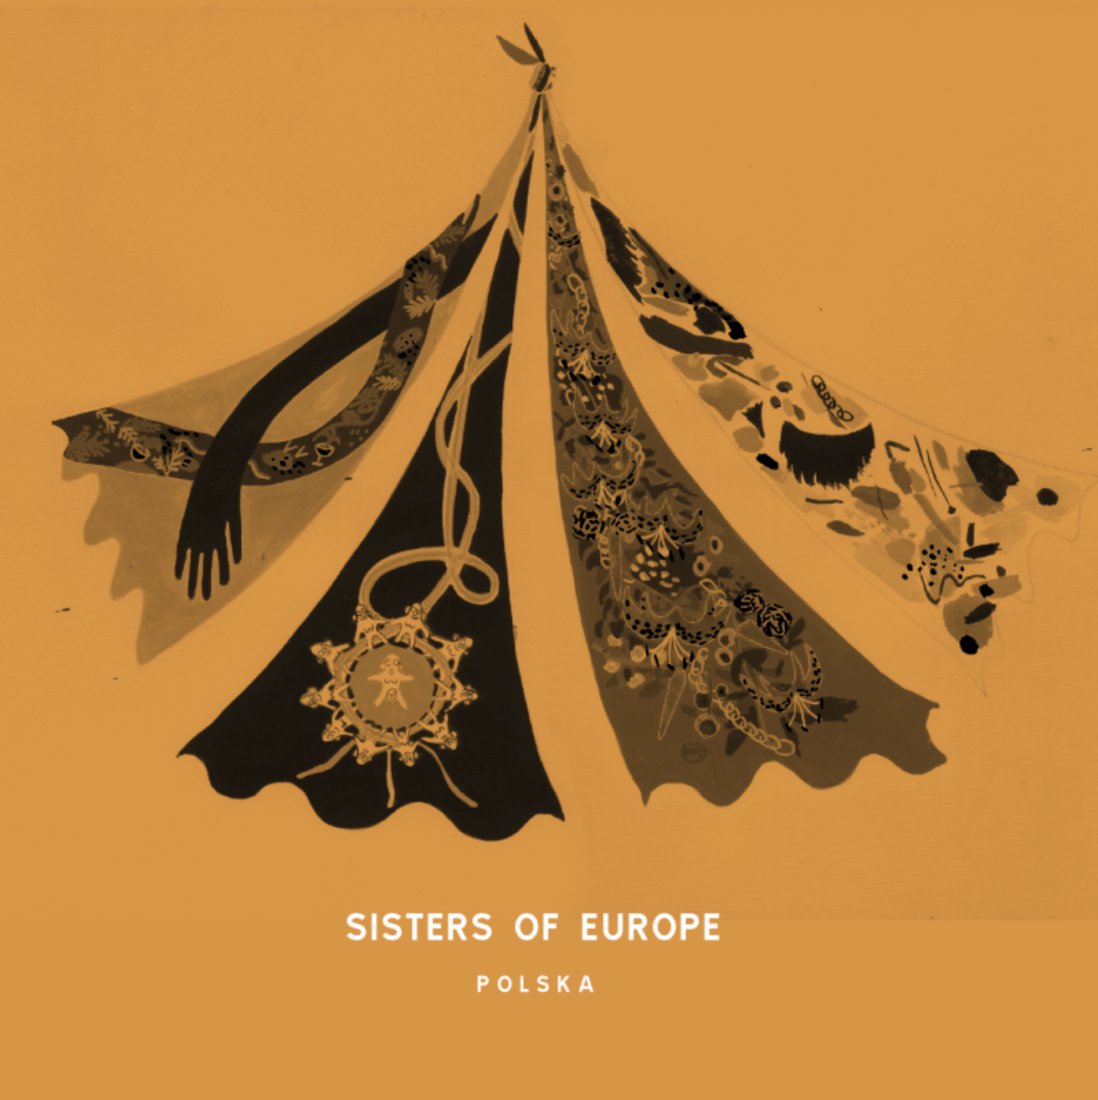 SISTERS OF EUROPE POLSKA